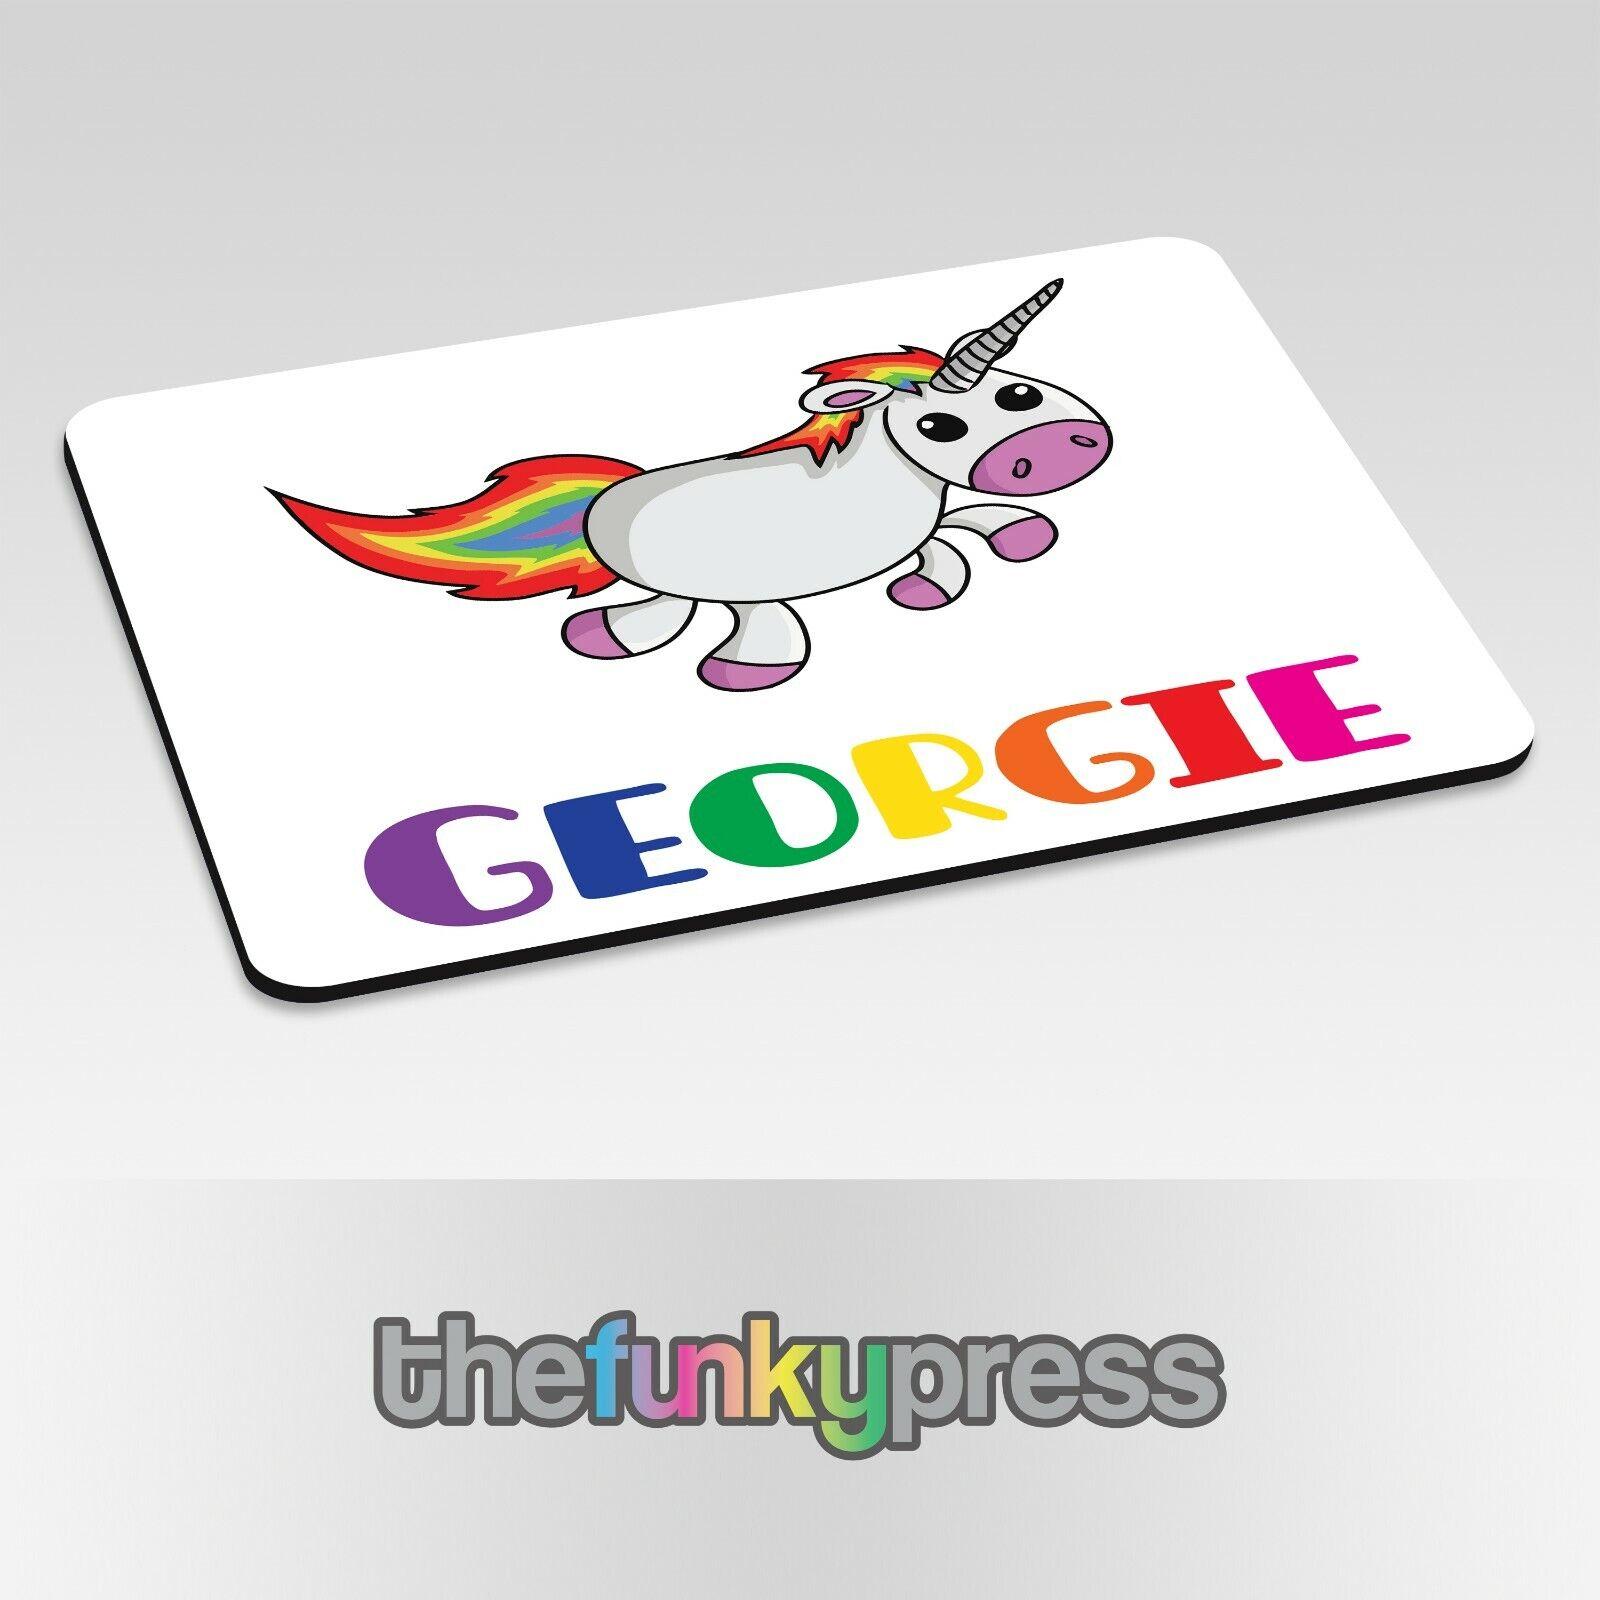 Personalizzata Unicorno Placemat piuttosto Rainbow aggiungere qualsiasi nome gratis gratis gratis ee5a47